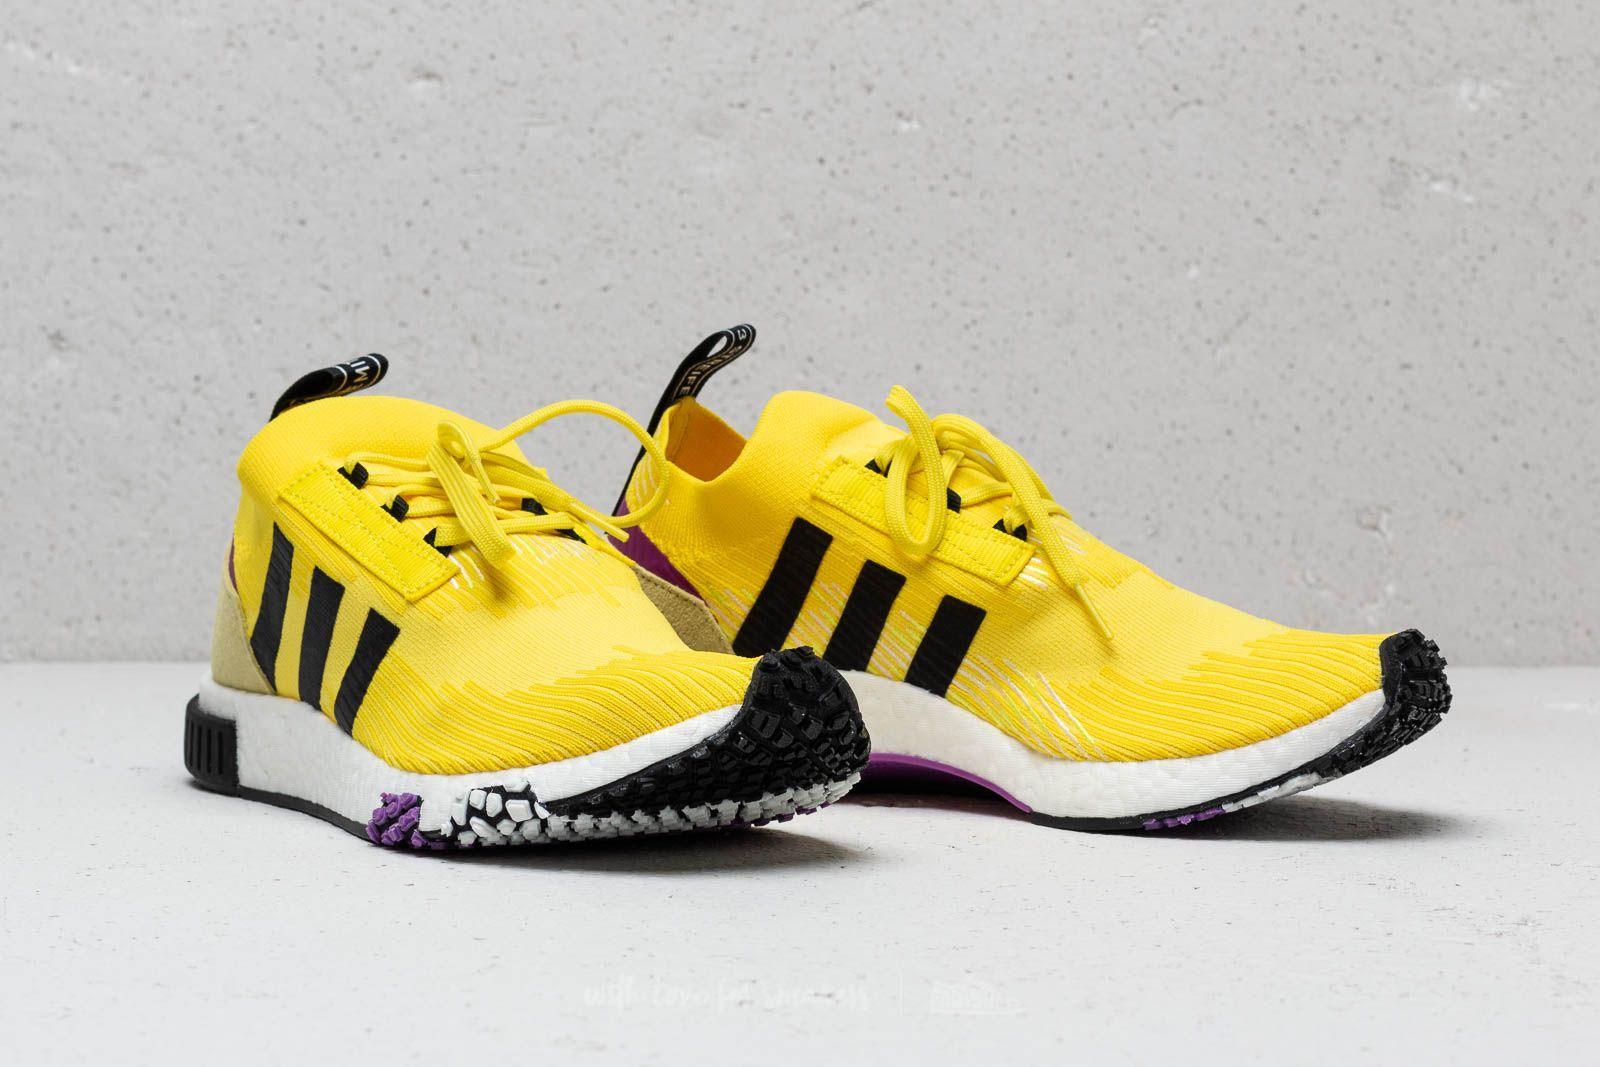 21240527abdd Lyst - adidas Originals Adidas Nmd Racer Primeknit Solar Yellow ...